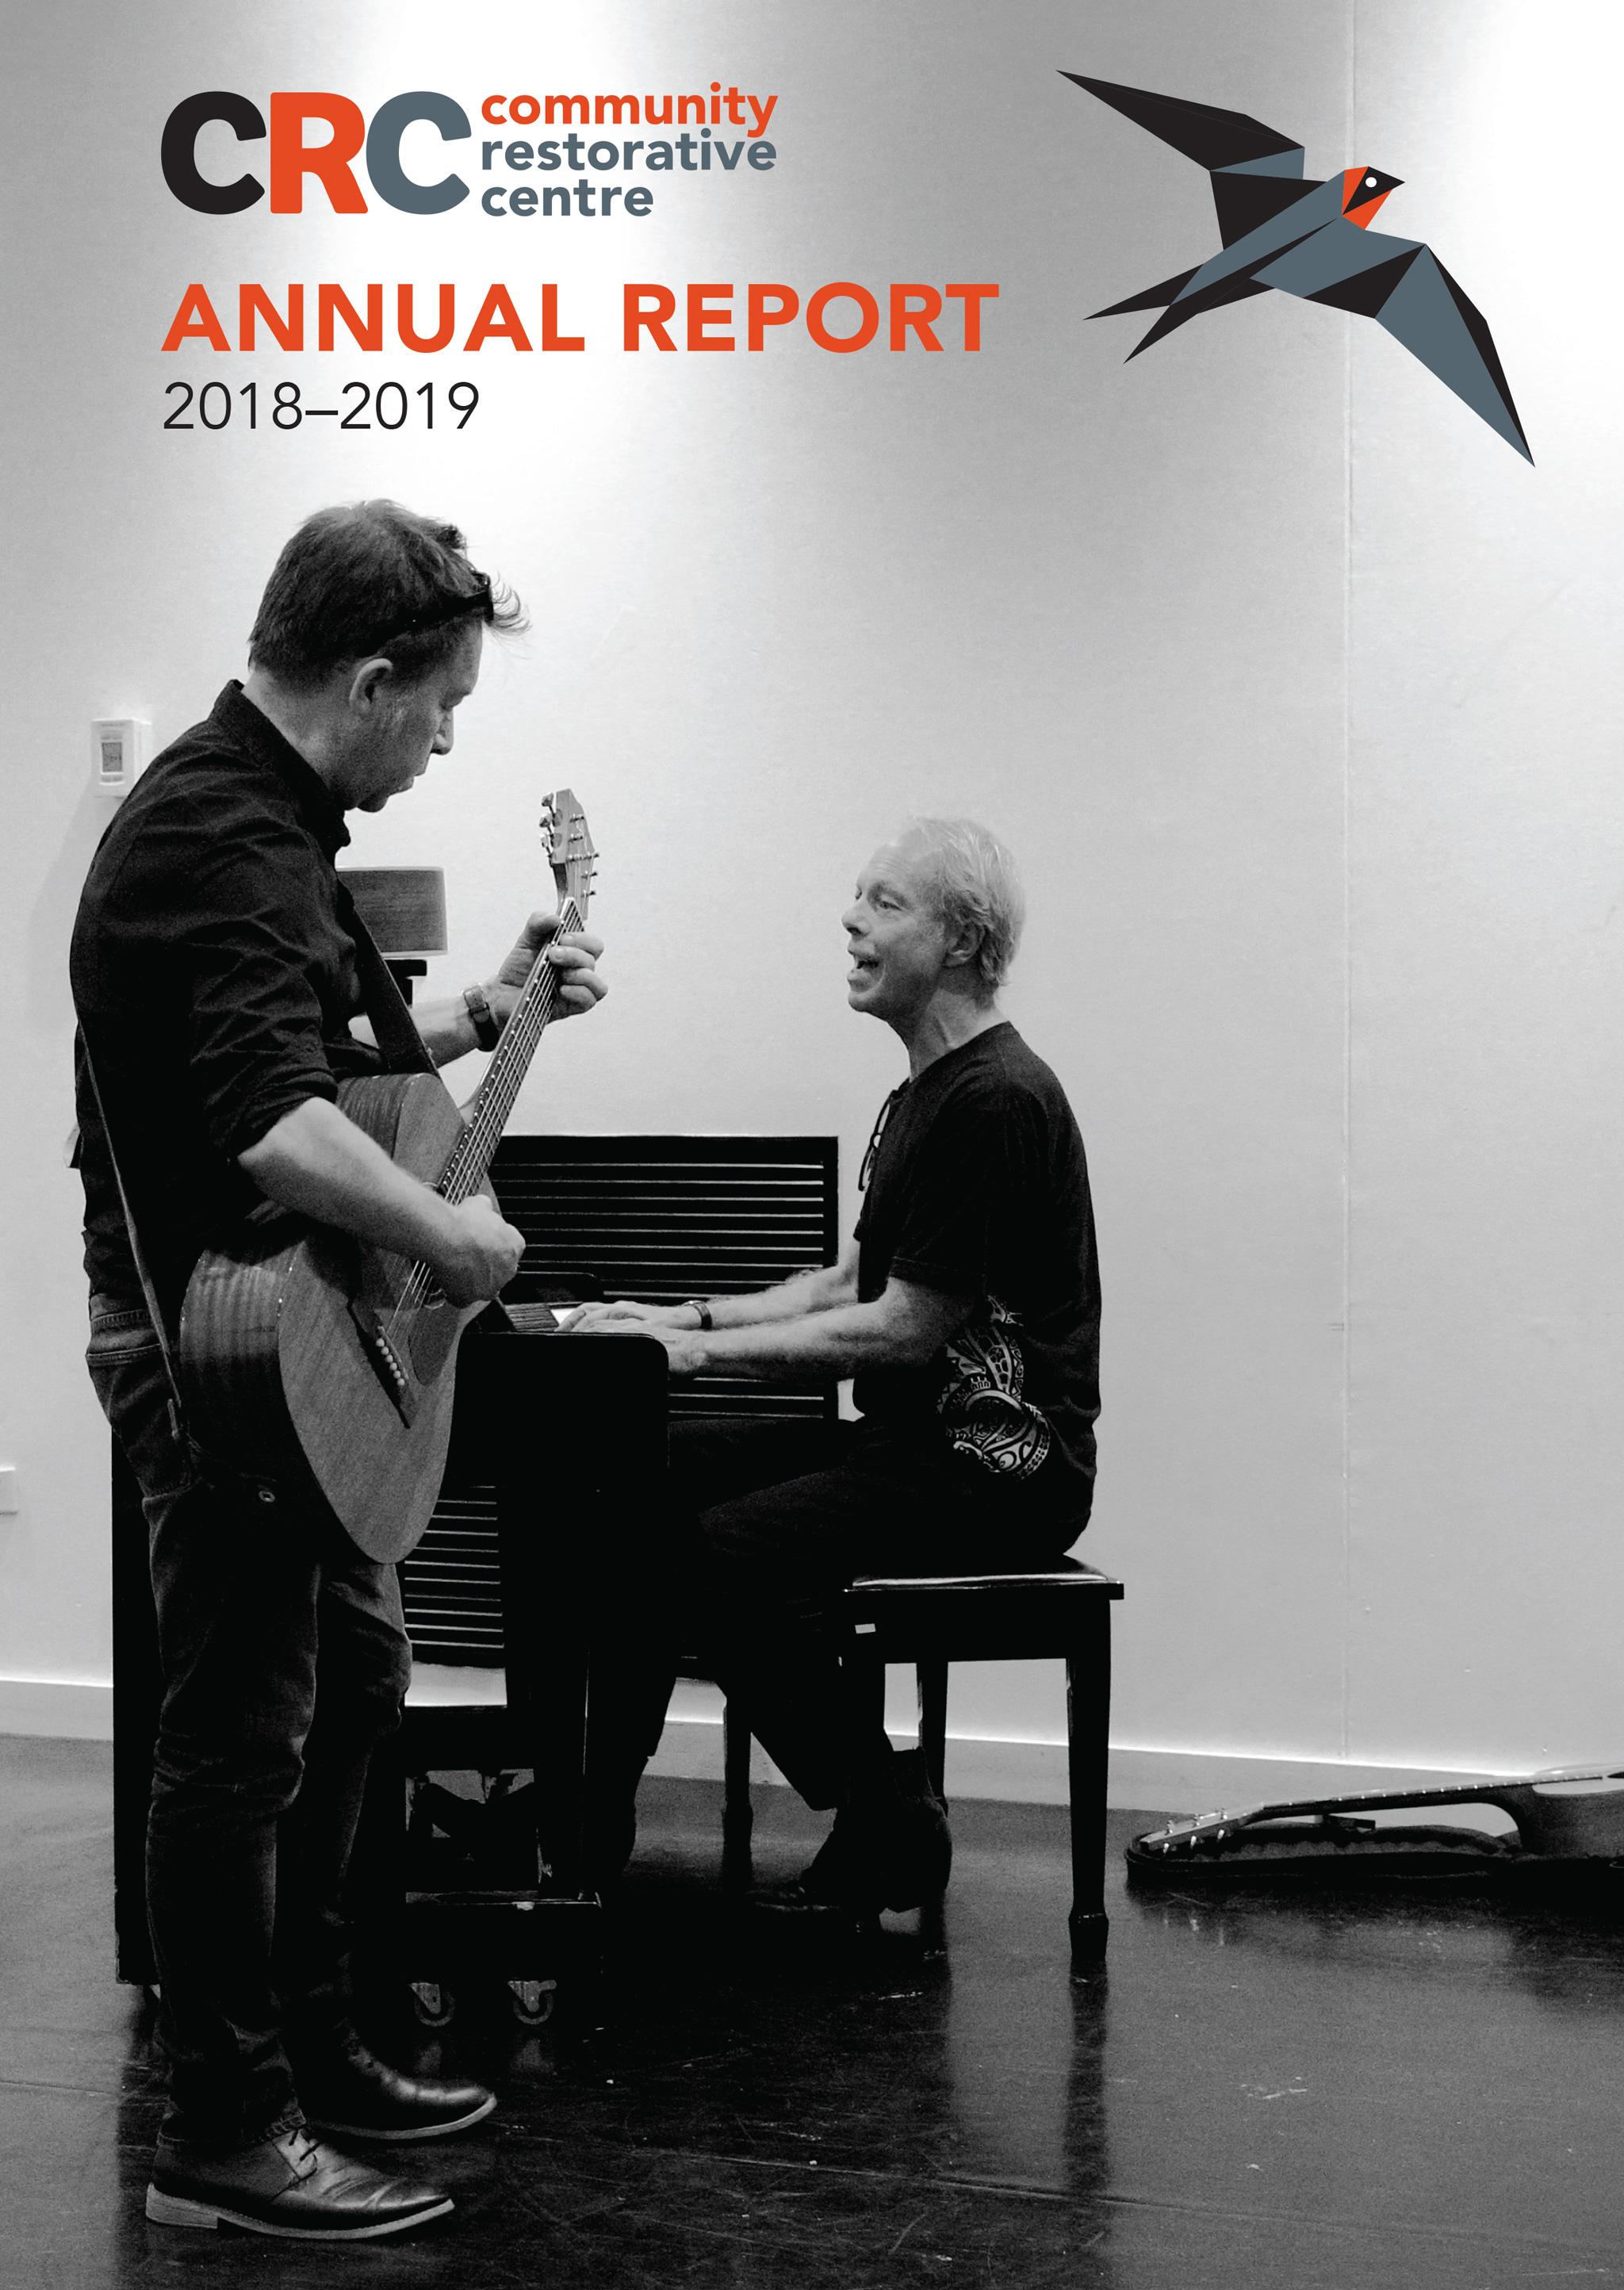 CRC Annual Report Design 2018/19 Frontpage